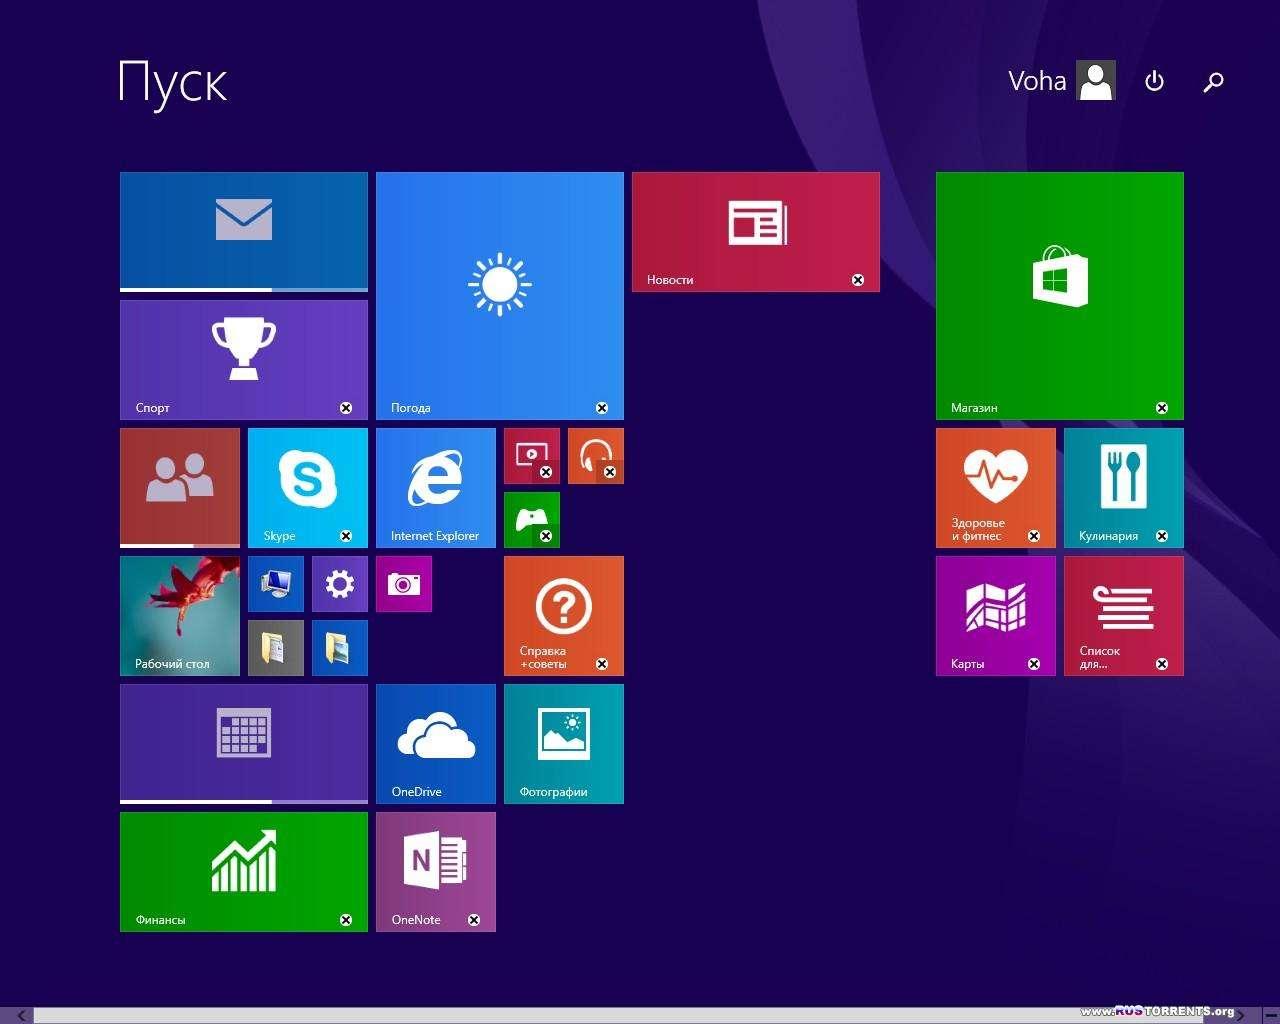 Windows 8.1 Update1 Core/Pro/Enterprise x86/x64 6.3 9600.17031 MSDN by Progmatron 22.04.2014 RUS